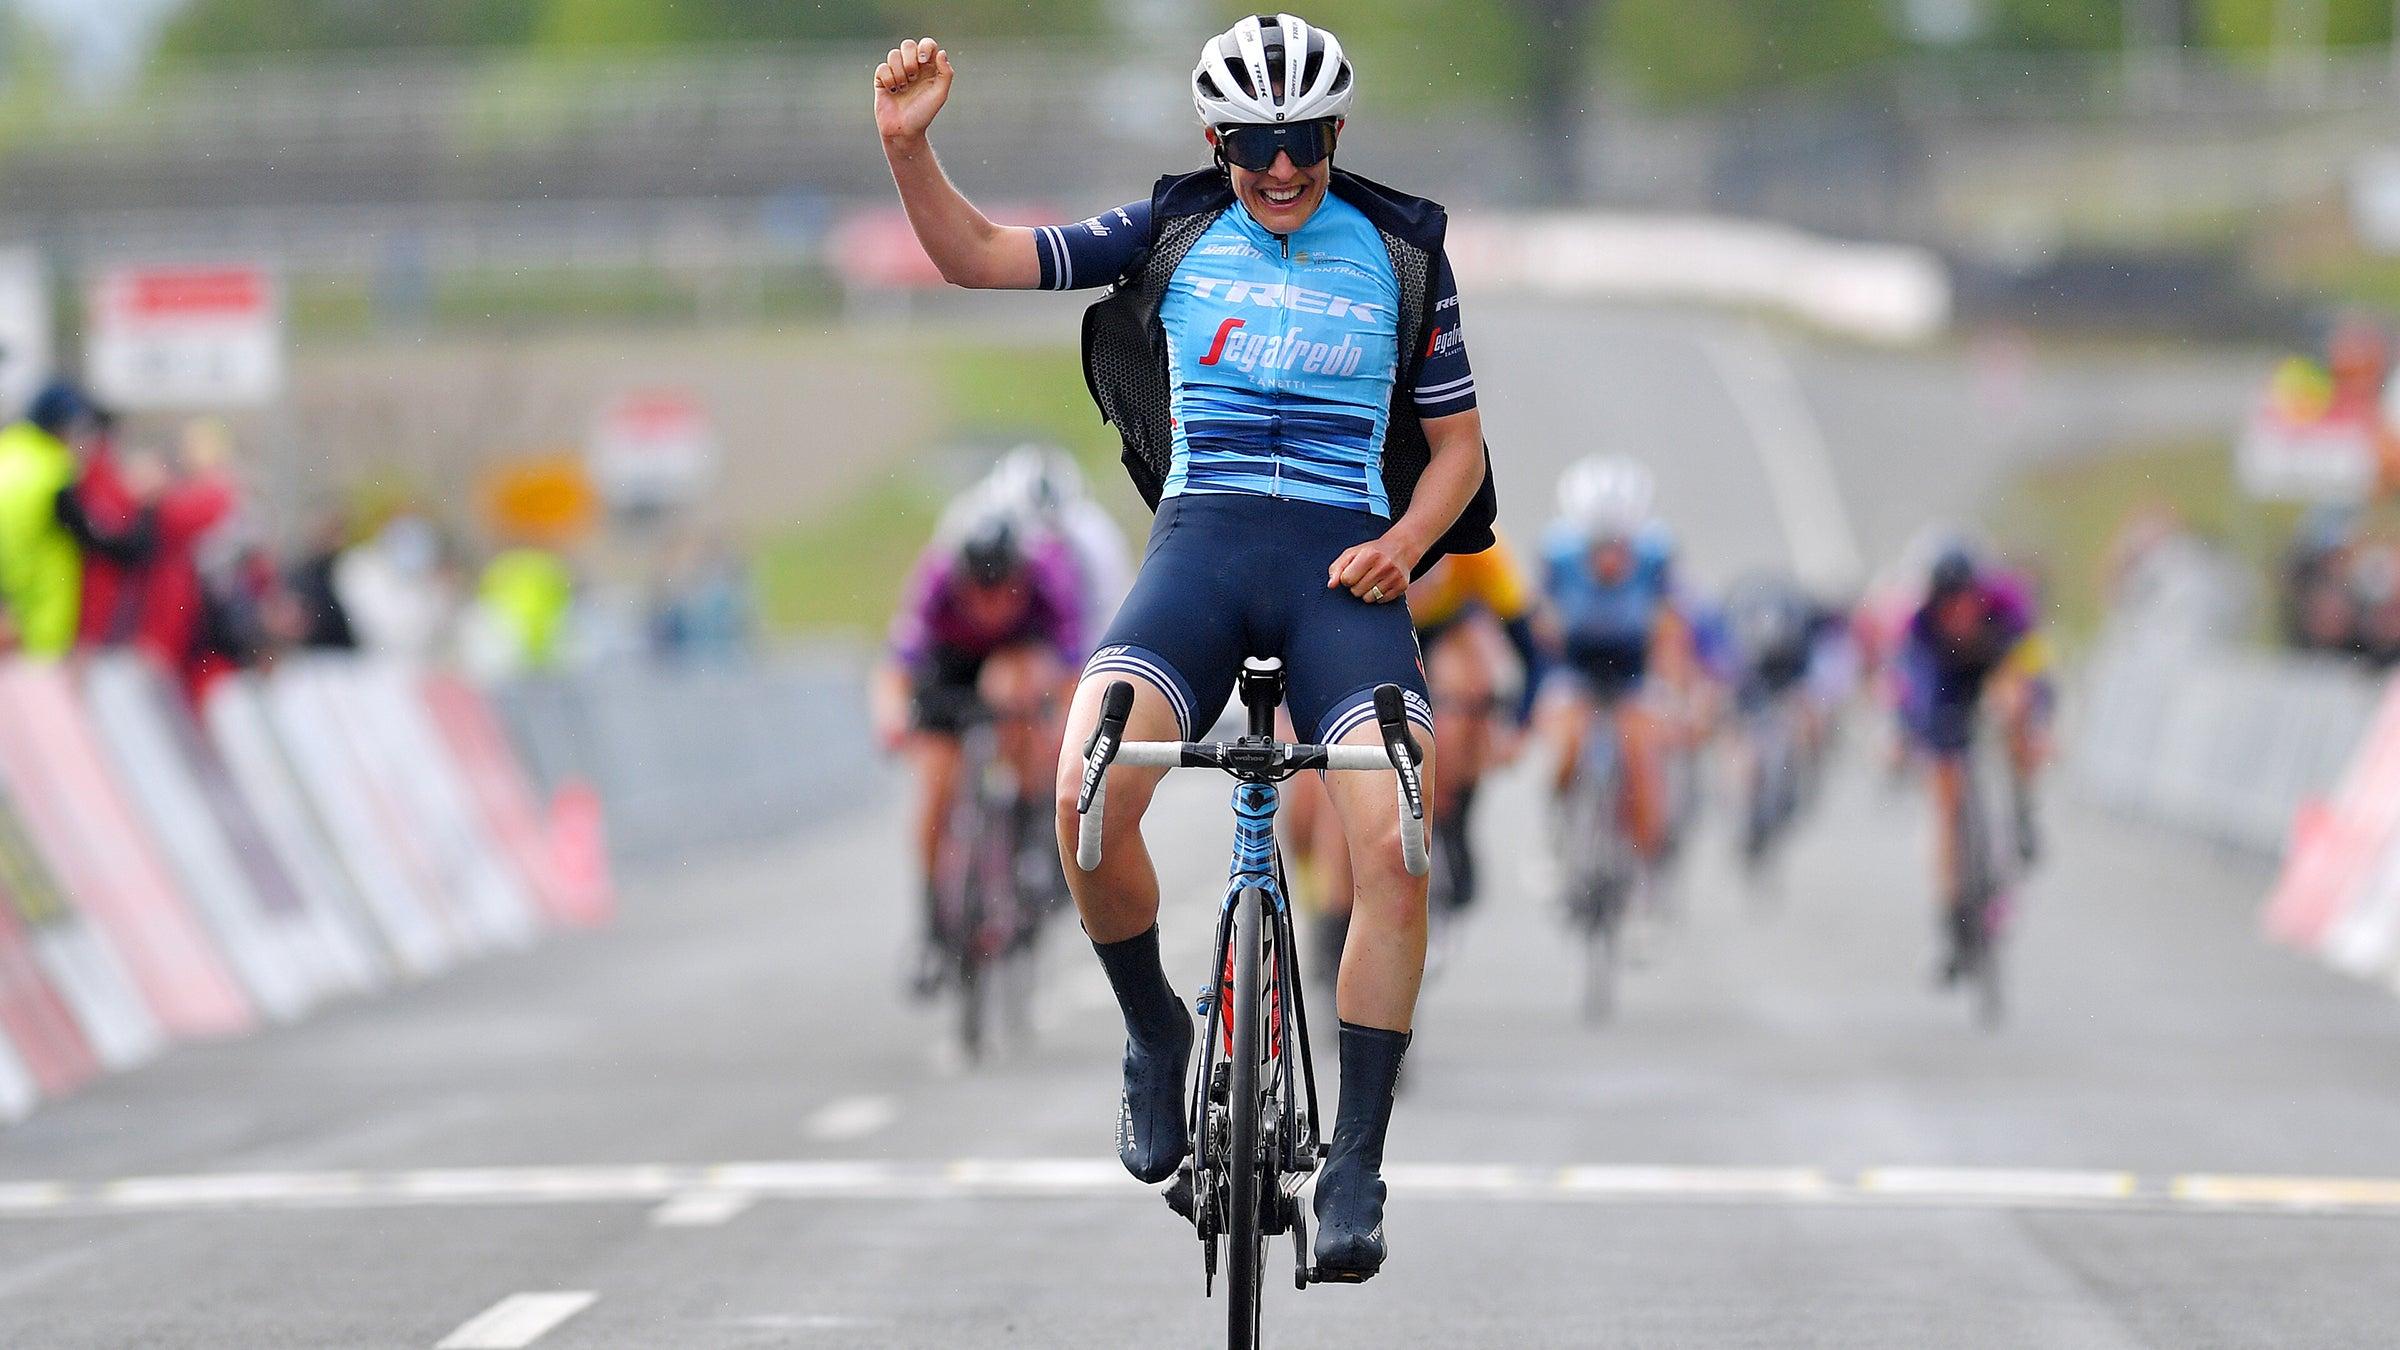 VN-ticker: Lucinda Brand wint LOTTO-Thüringen etappe 3, Brandon McNulty, Joe Dombrowski rijden Critérium du Dauphiné